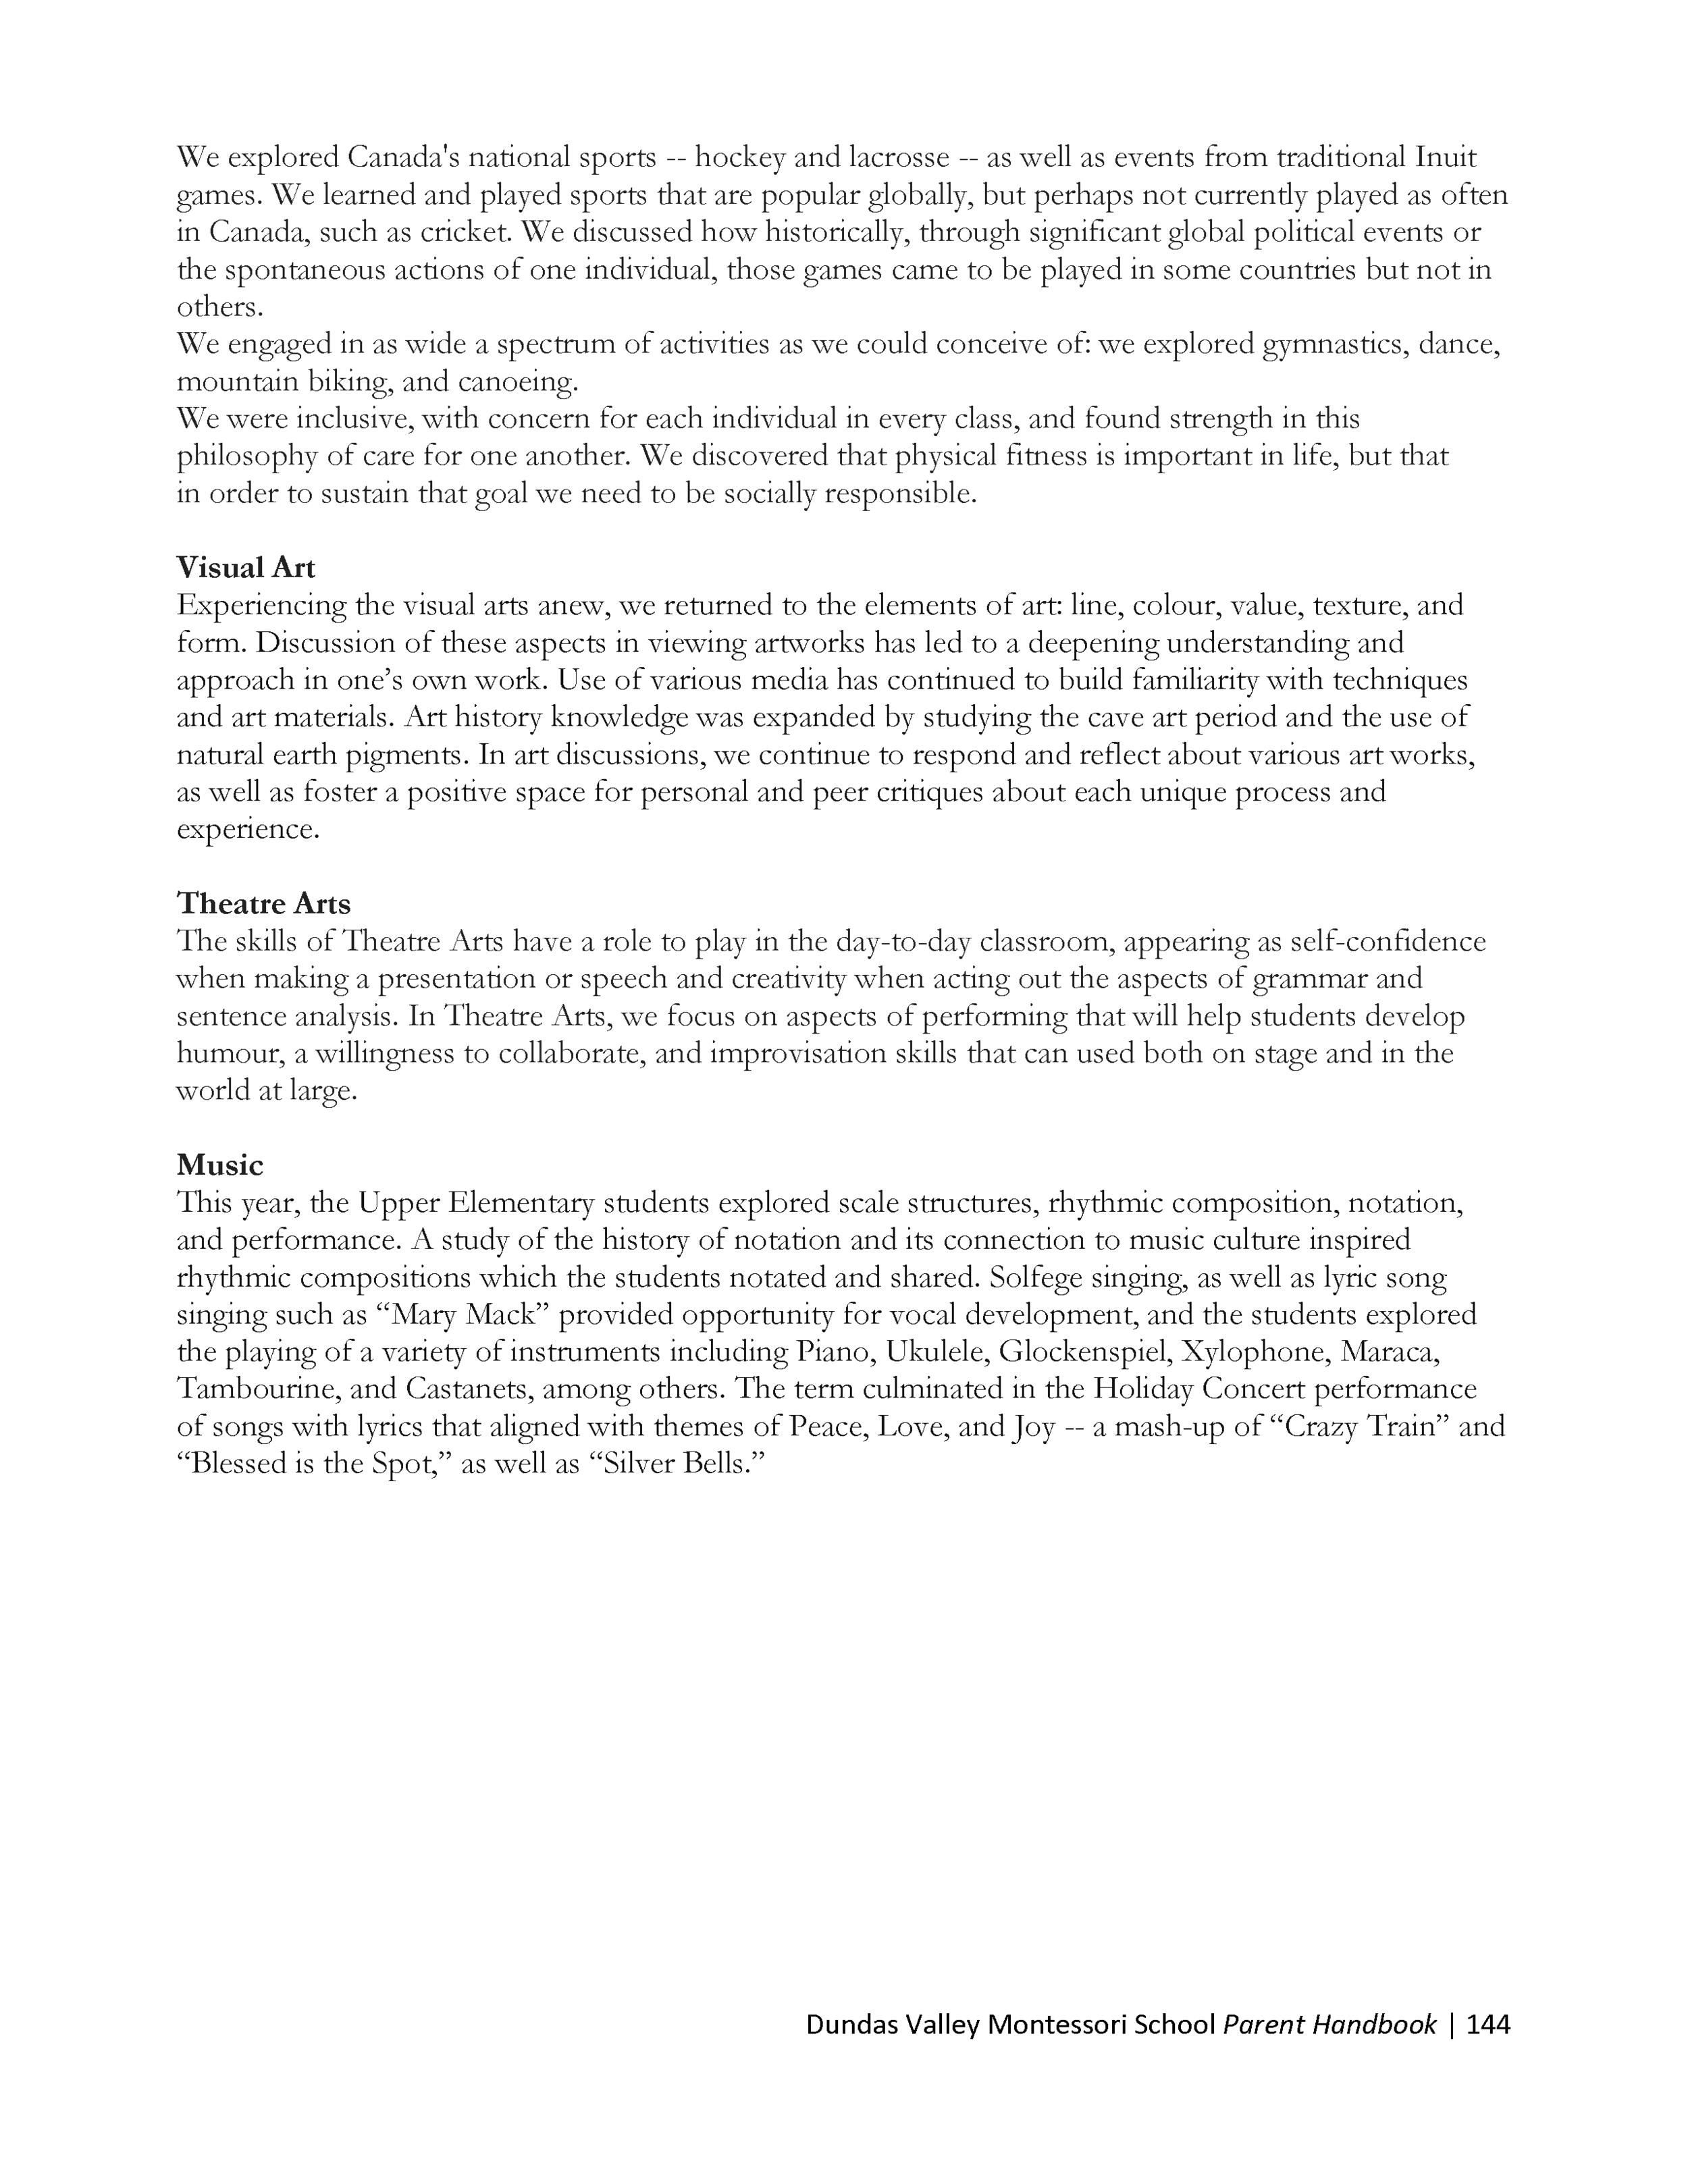 DVMS-Parent-Handbook-19-20_Page_146.png